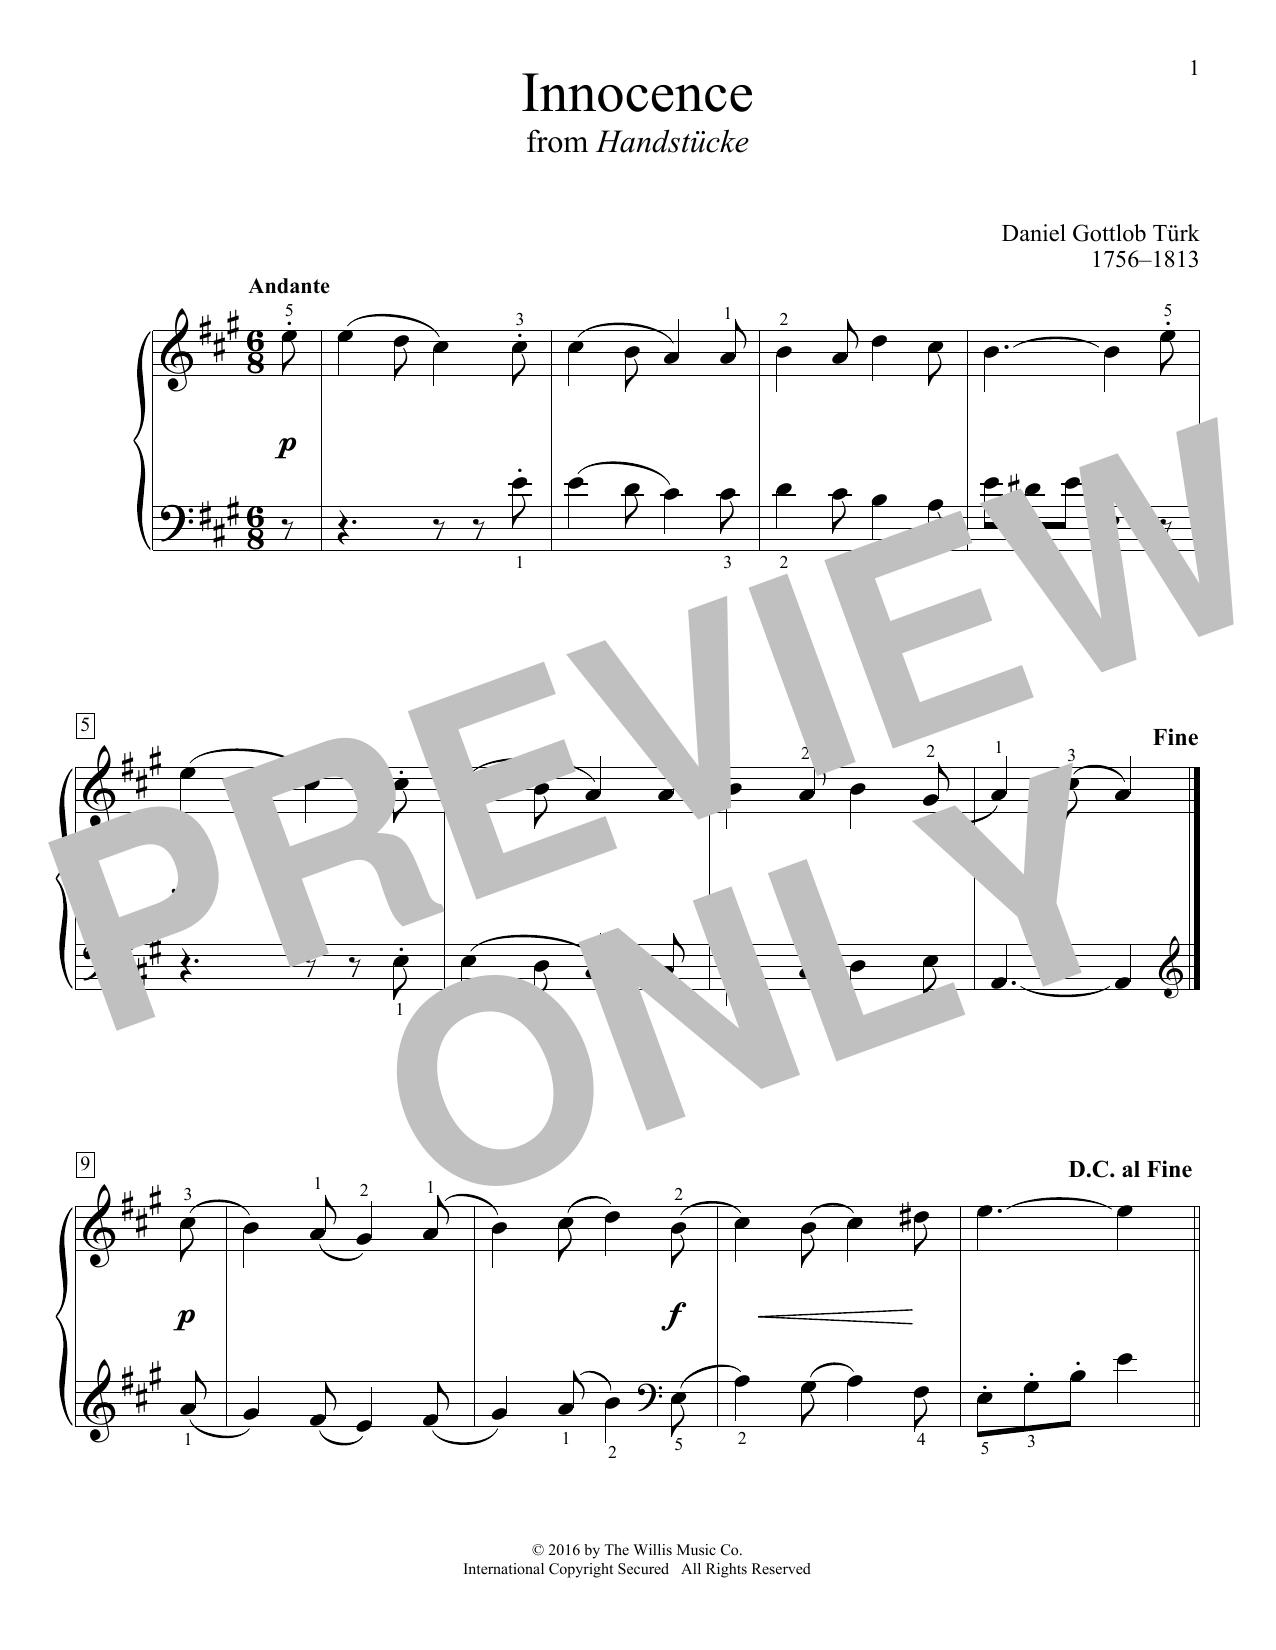 Daniel Gottlob Türk Innocence sheet music notes and chords. Download Printable PDF.